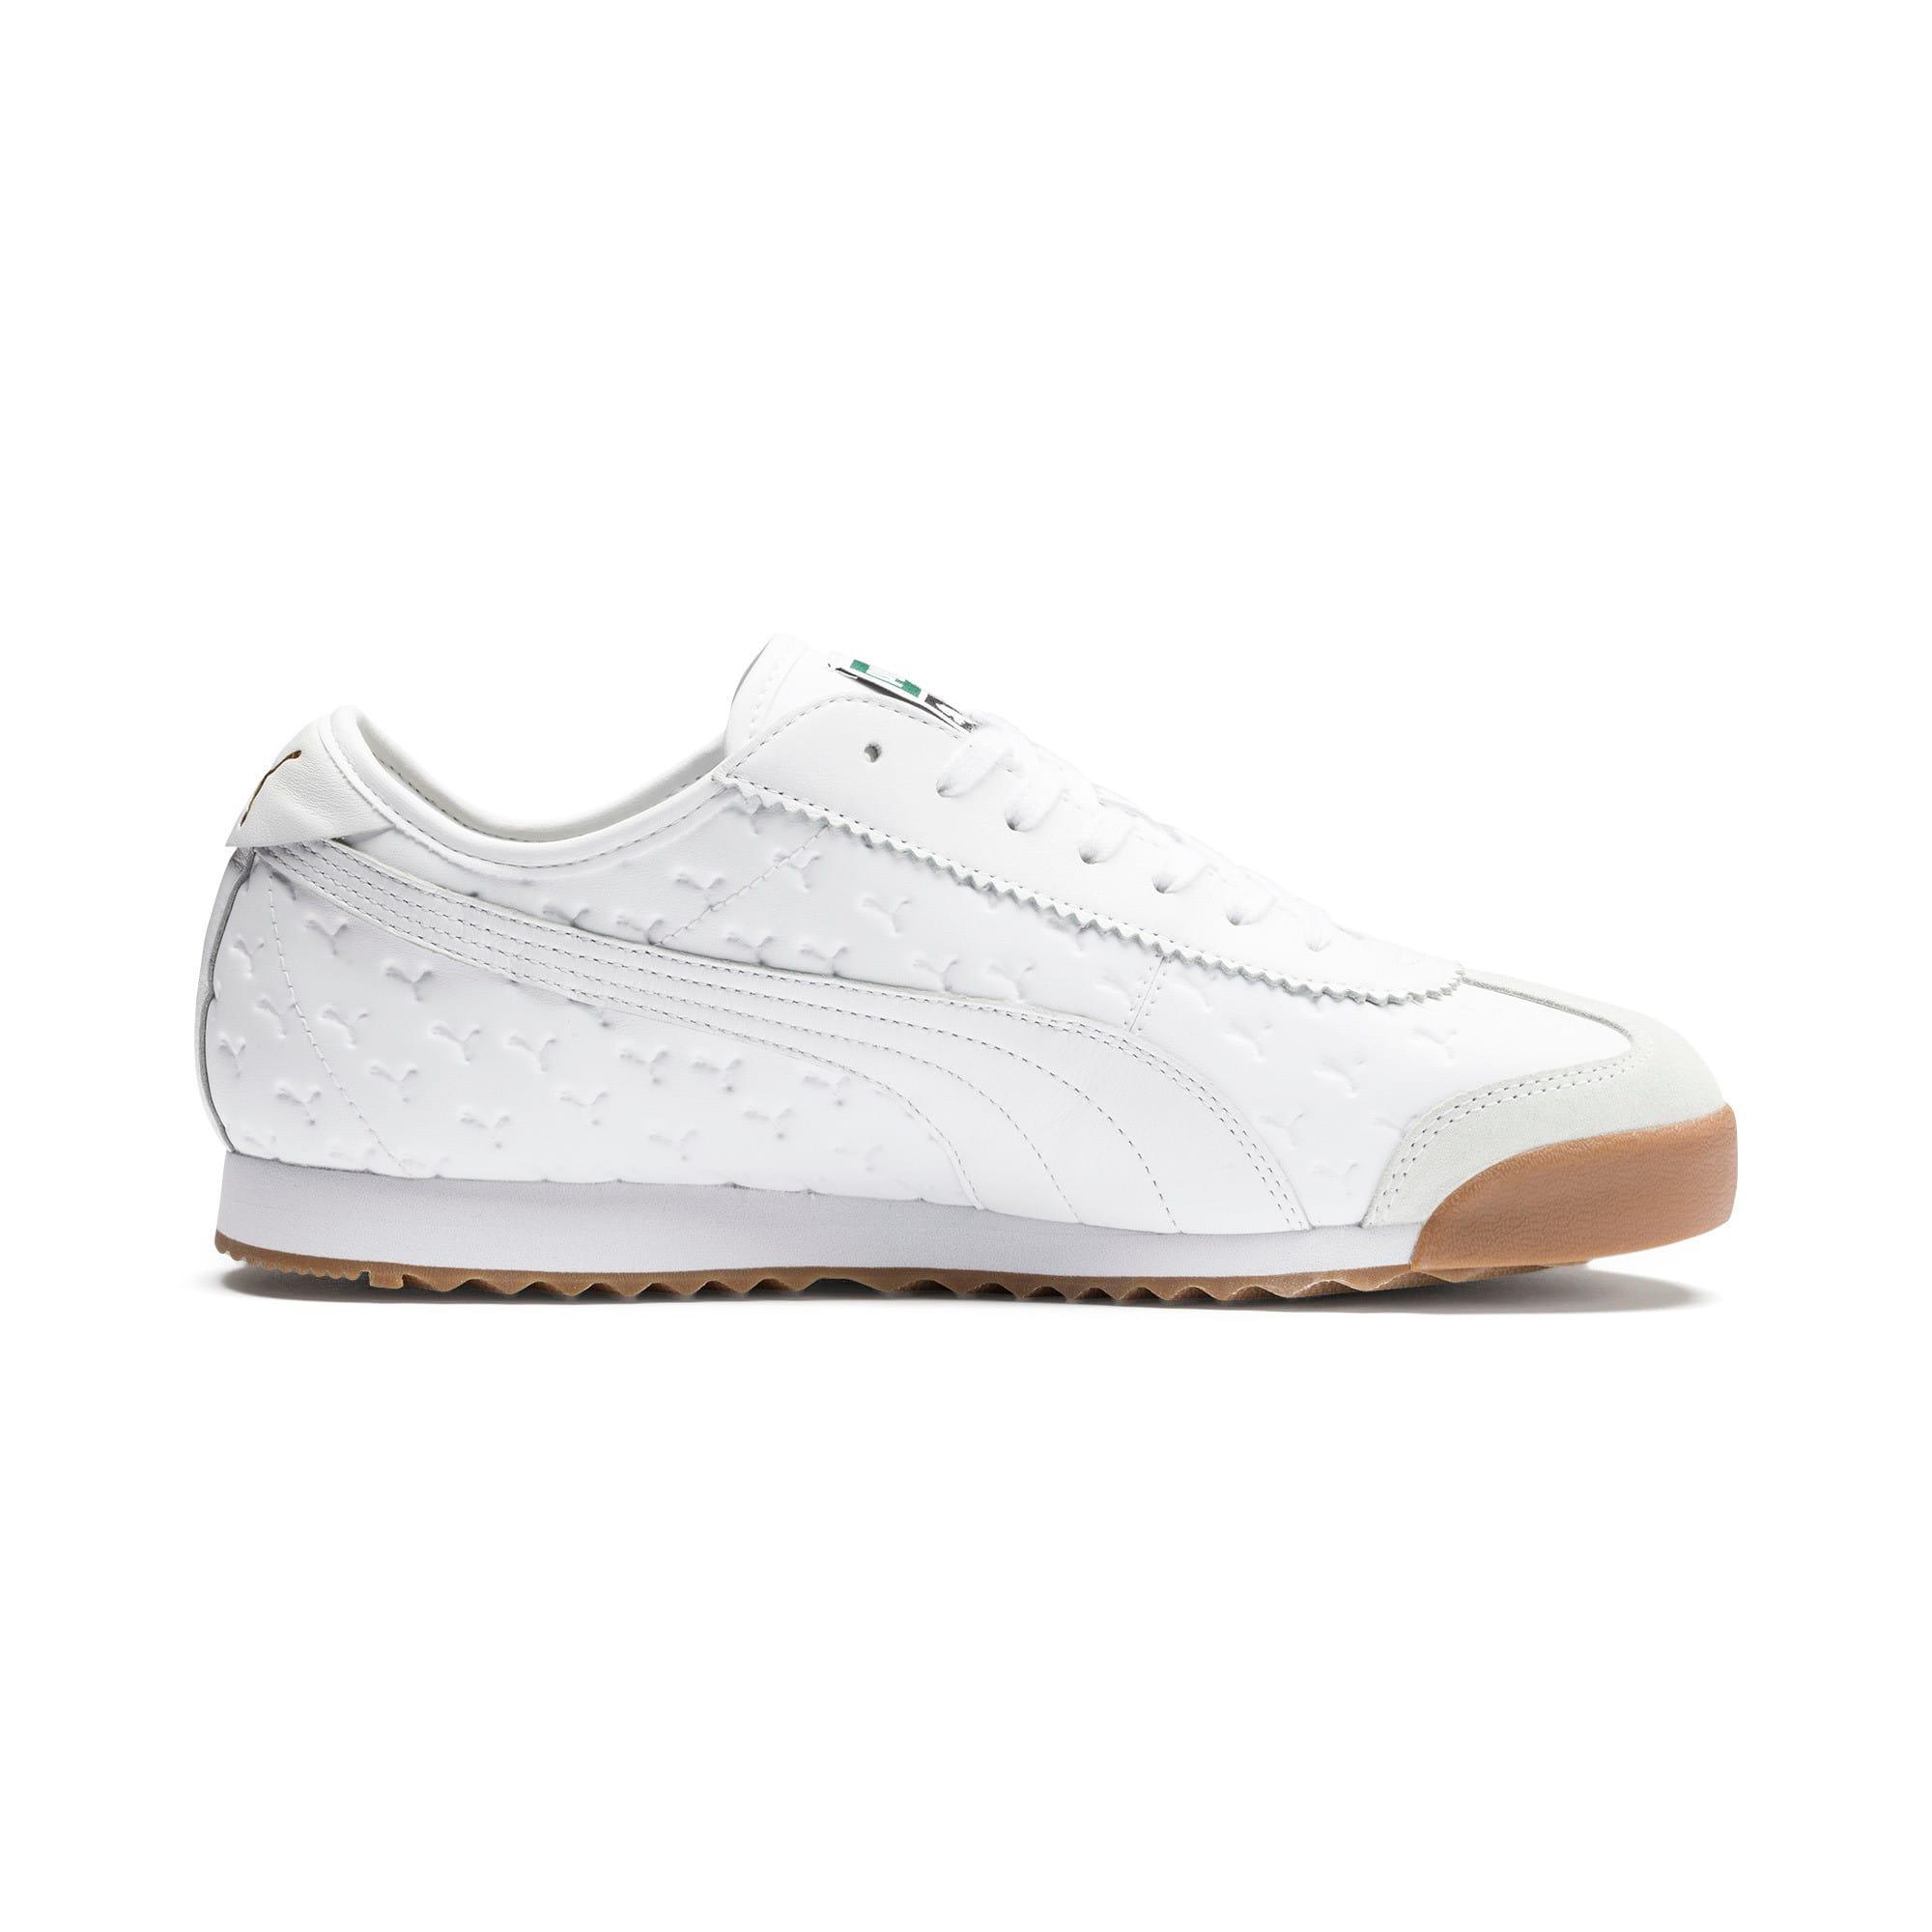 Thumbnail 6 of Roma '68 Gum Sneakers, Puma White-Puma White, medium